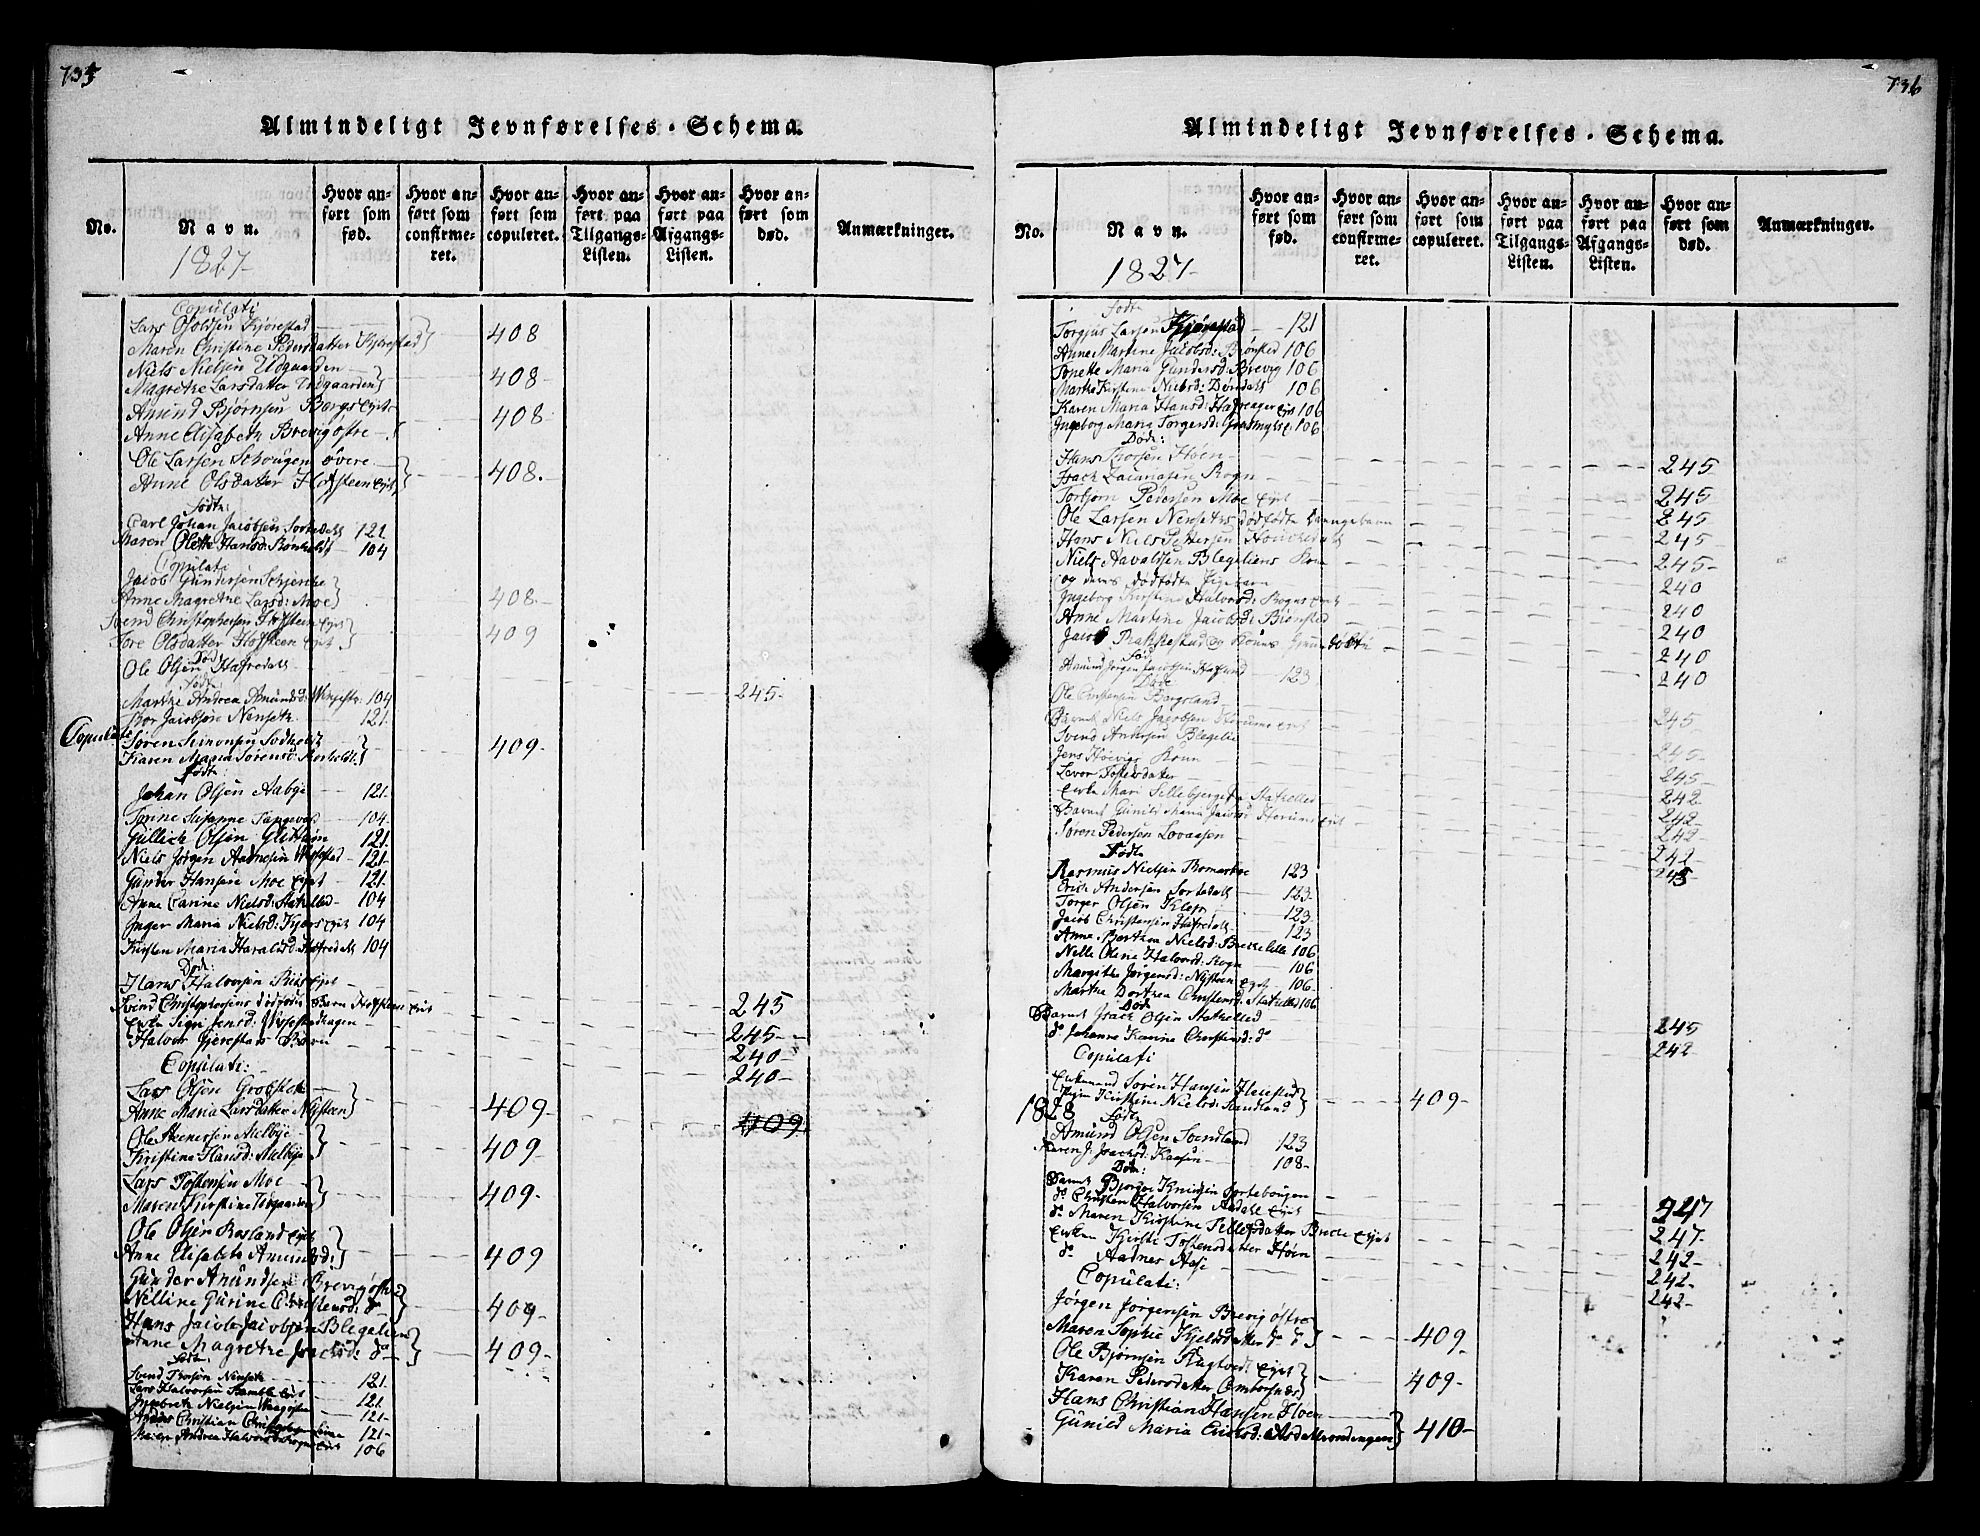 SAKO, Bamble kirkebøker, F/Fa/L0003: Ministerialbok nr. I 3 /1, 1814-1834, s. 735-736